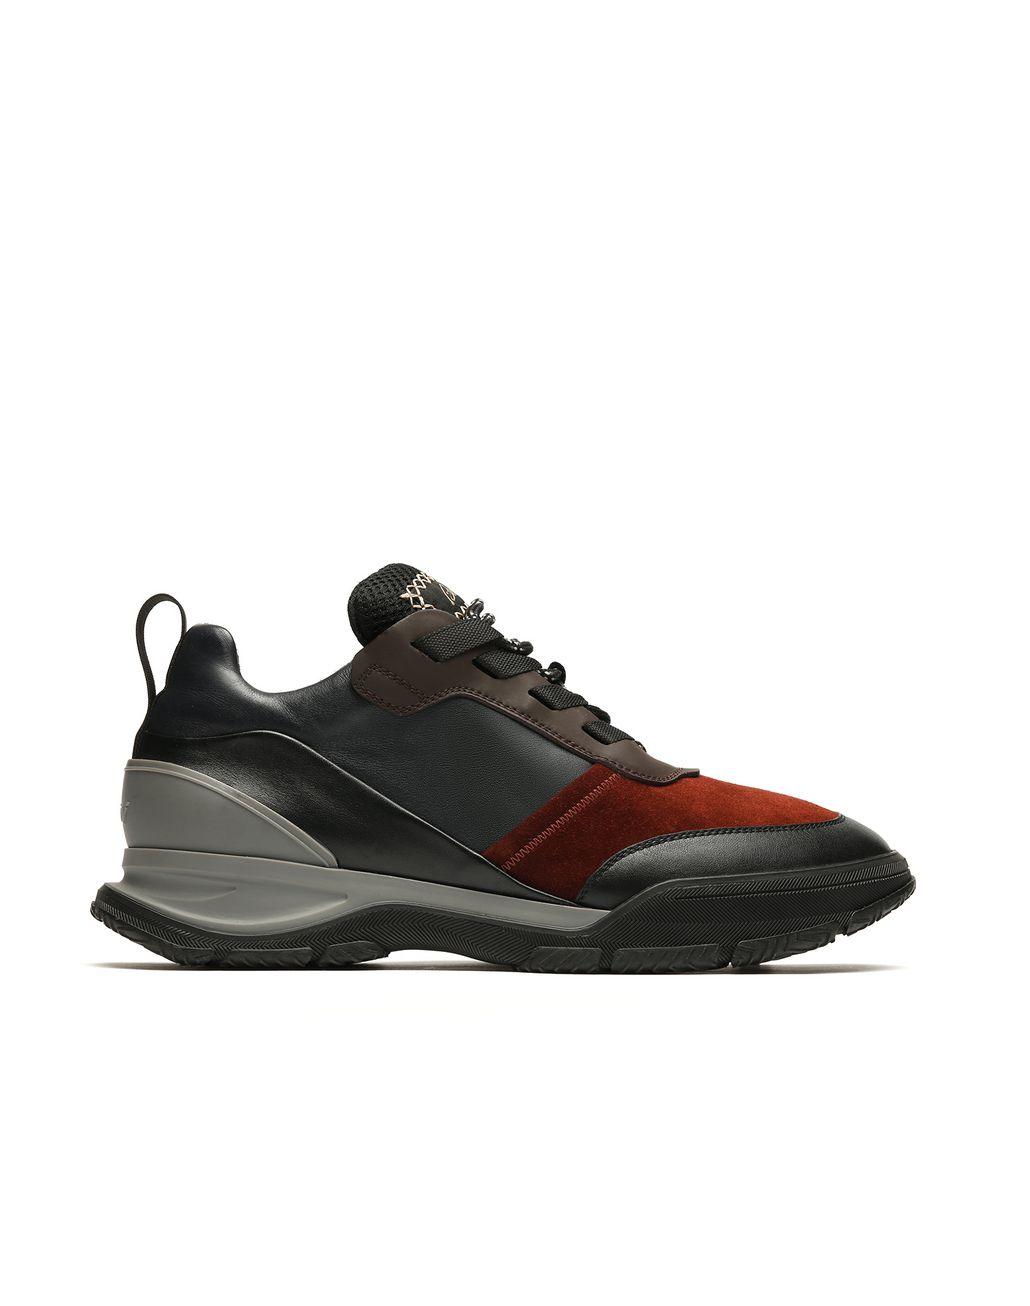 BRIONI Black Sneakers Sneakers Man f